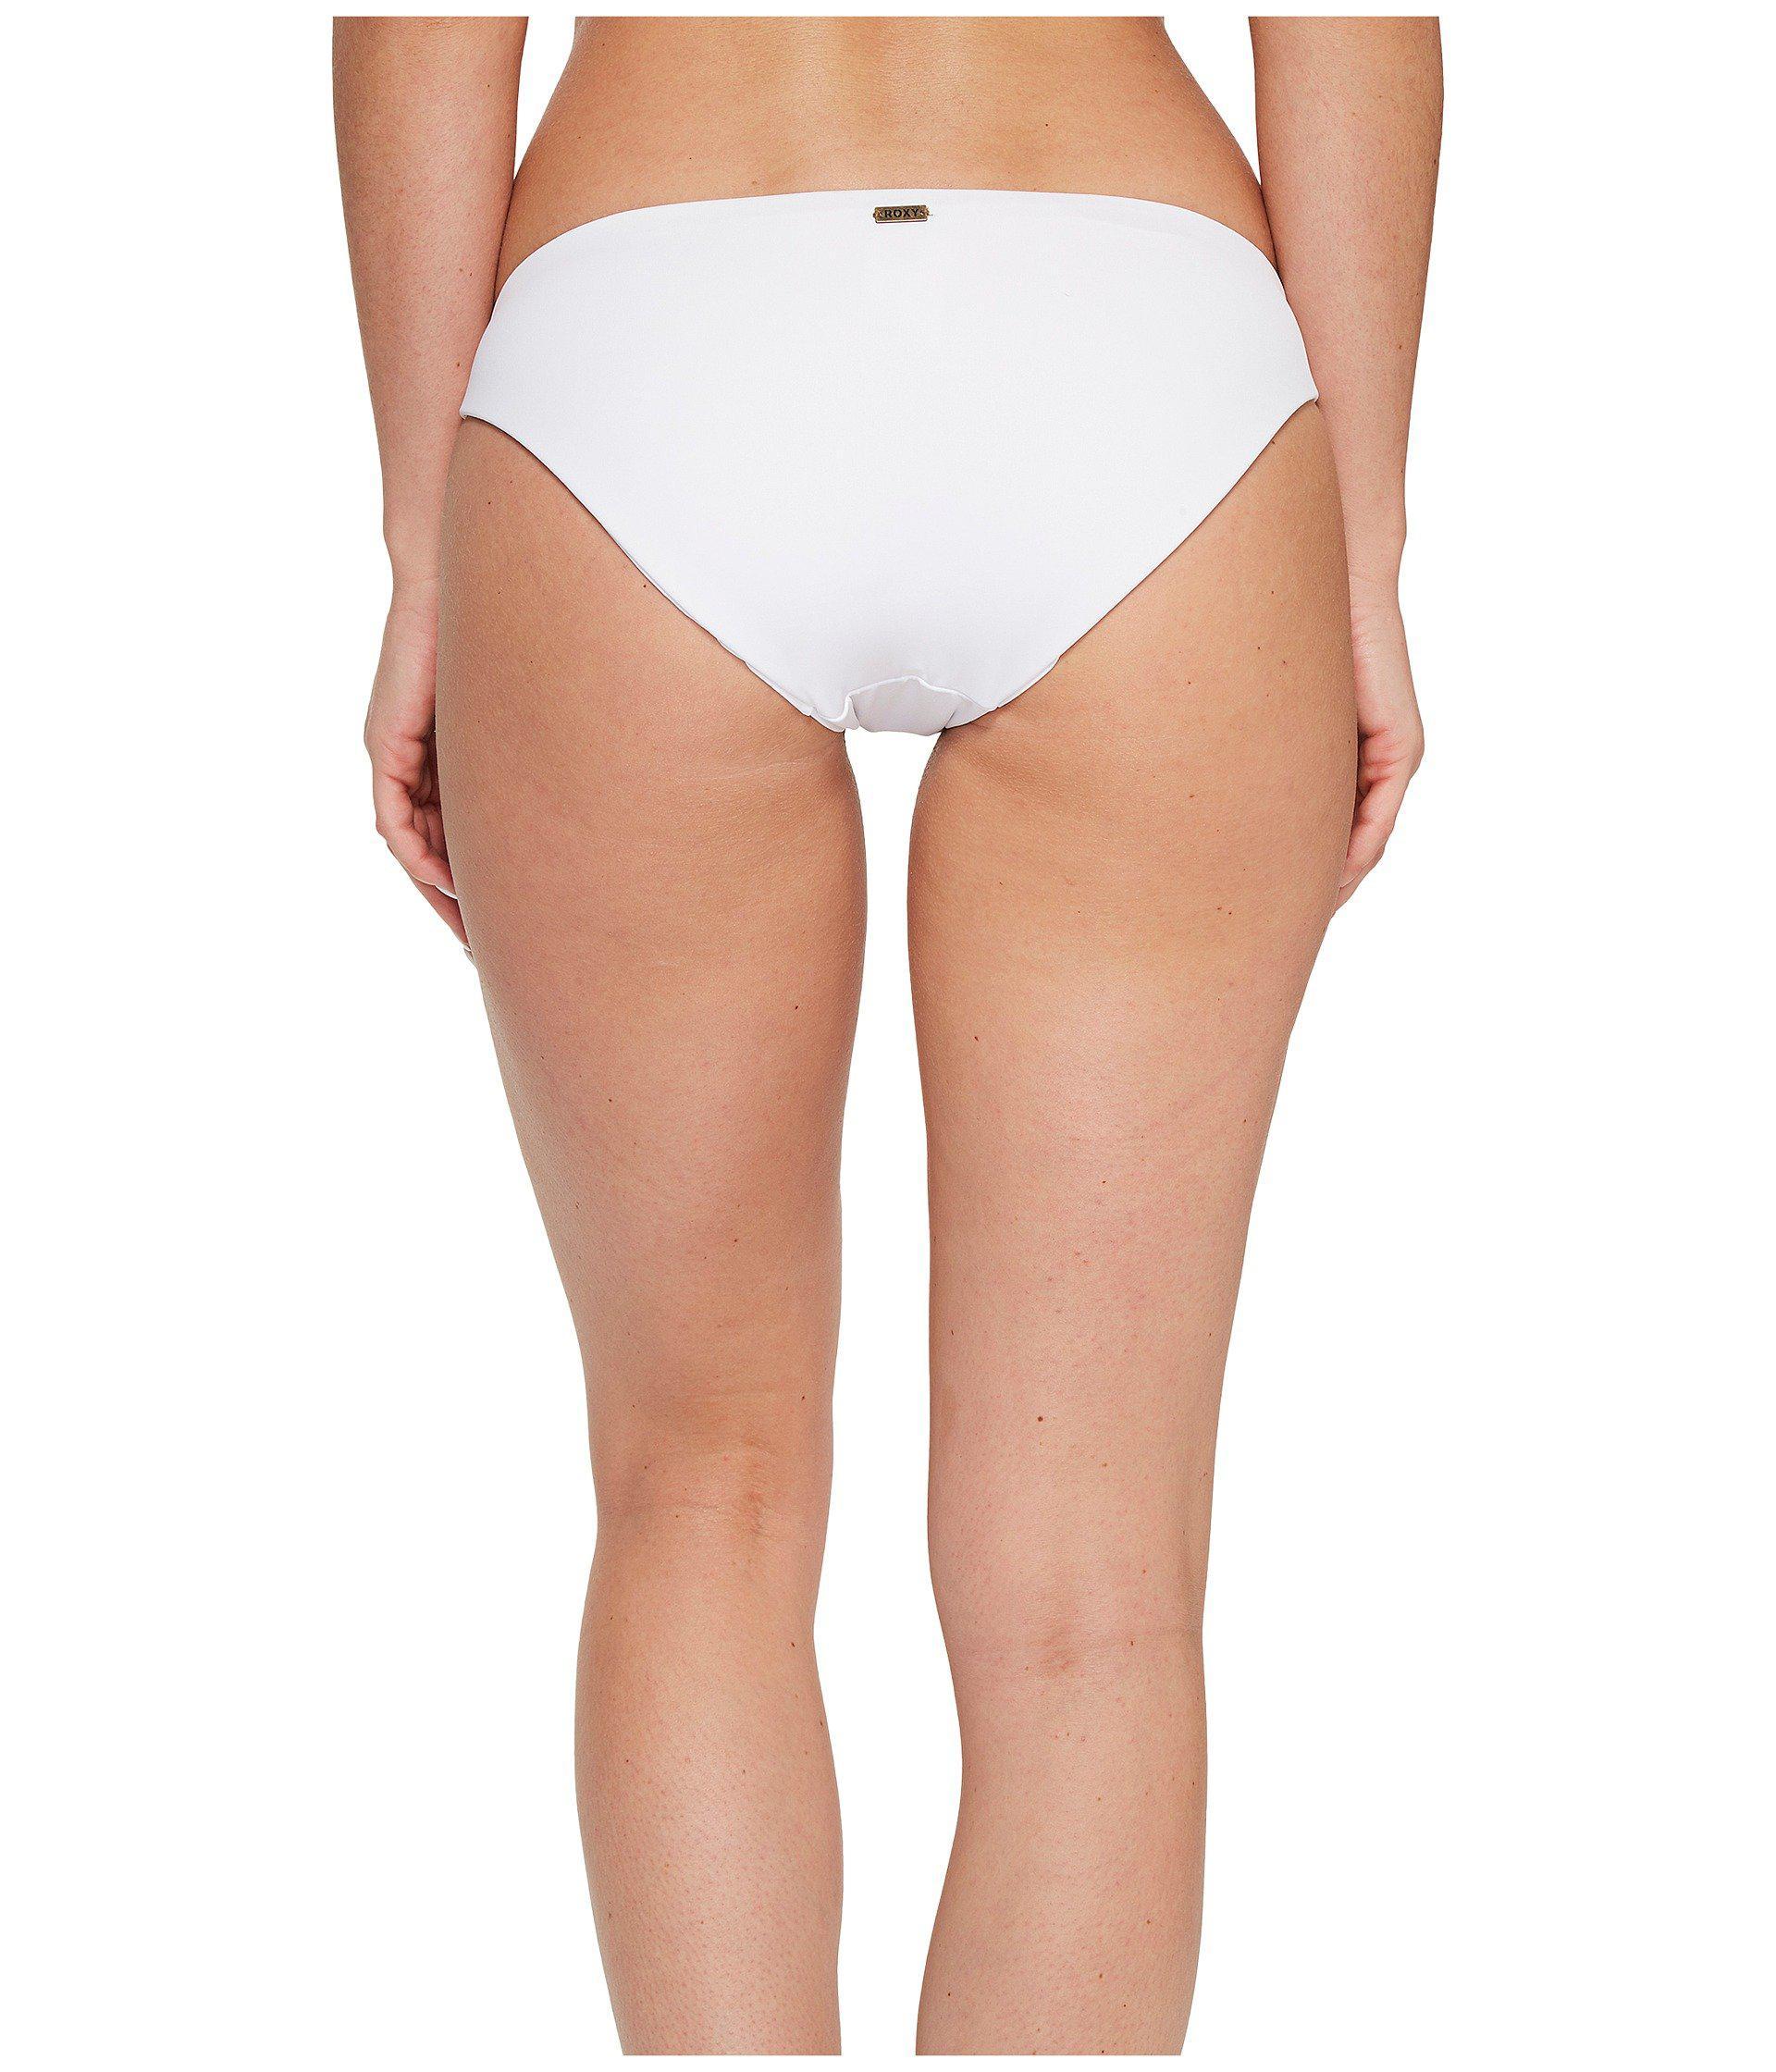 b3ffebcccbb5c Lyst - Roxy Strappy Love Reversible 70 s Bikini Bottom in White